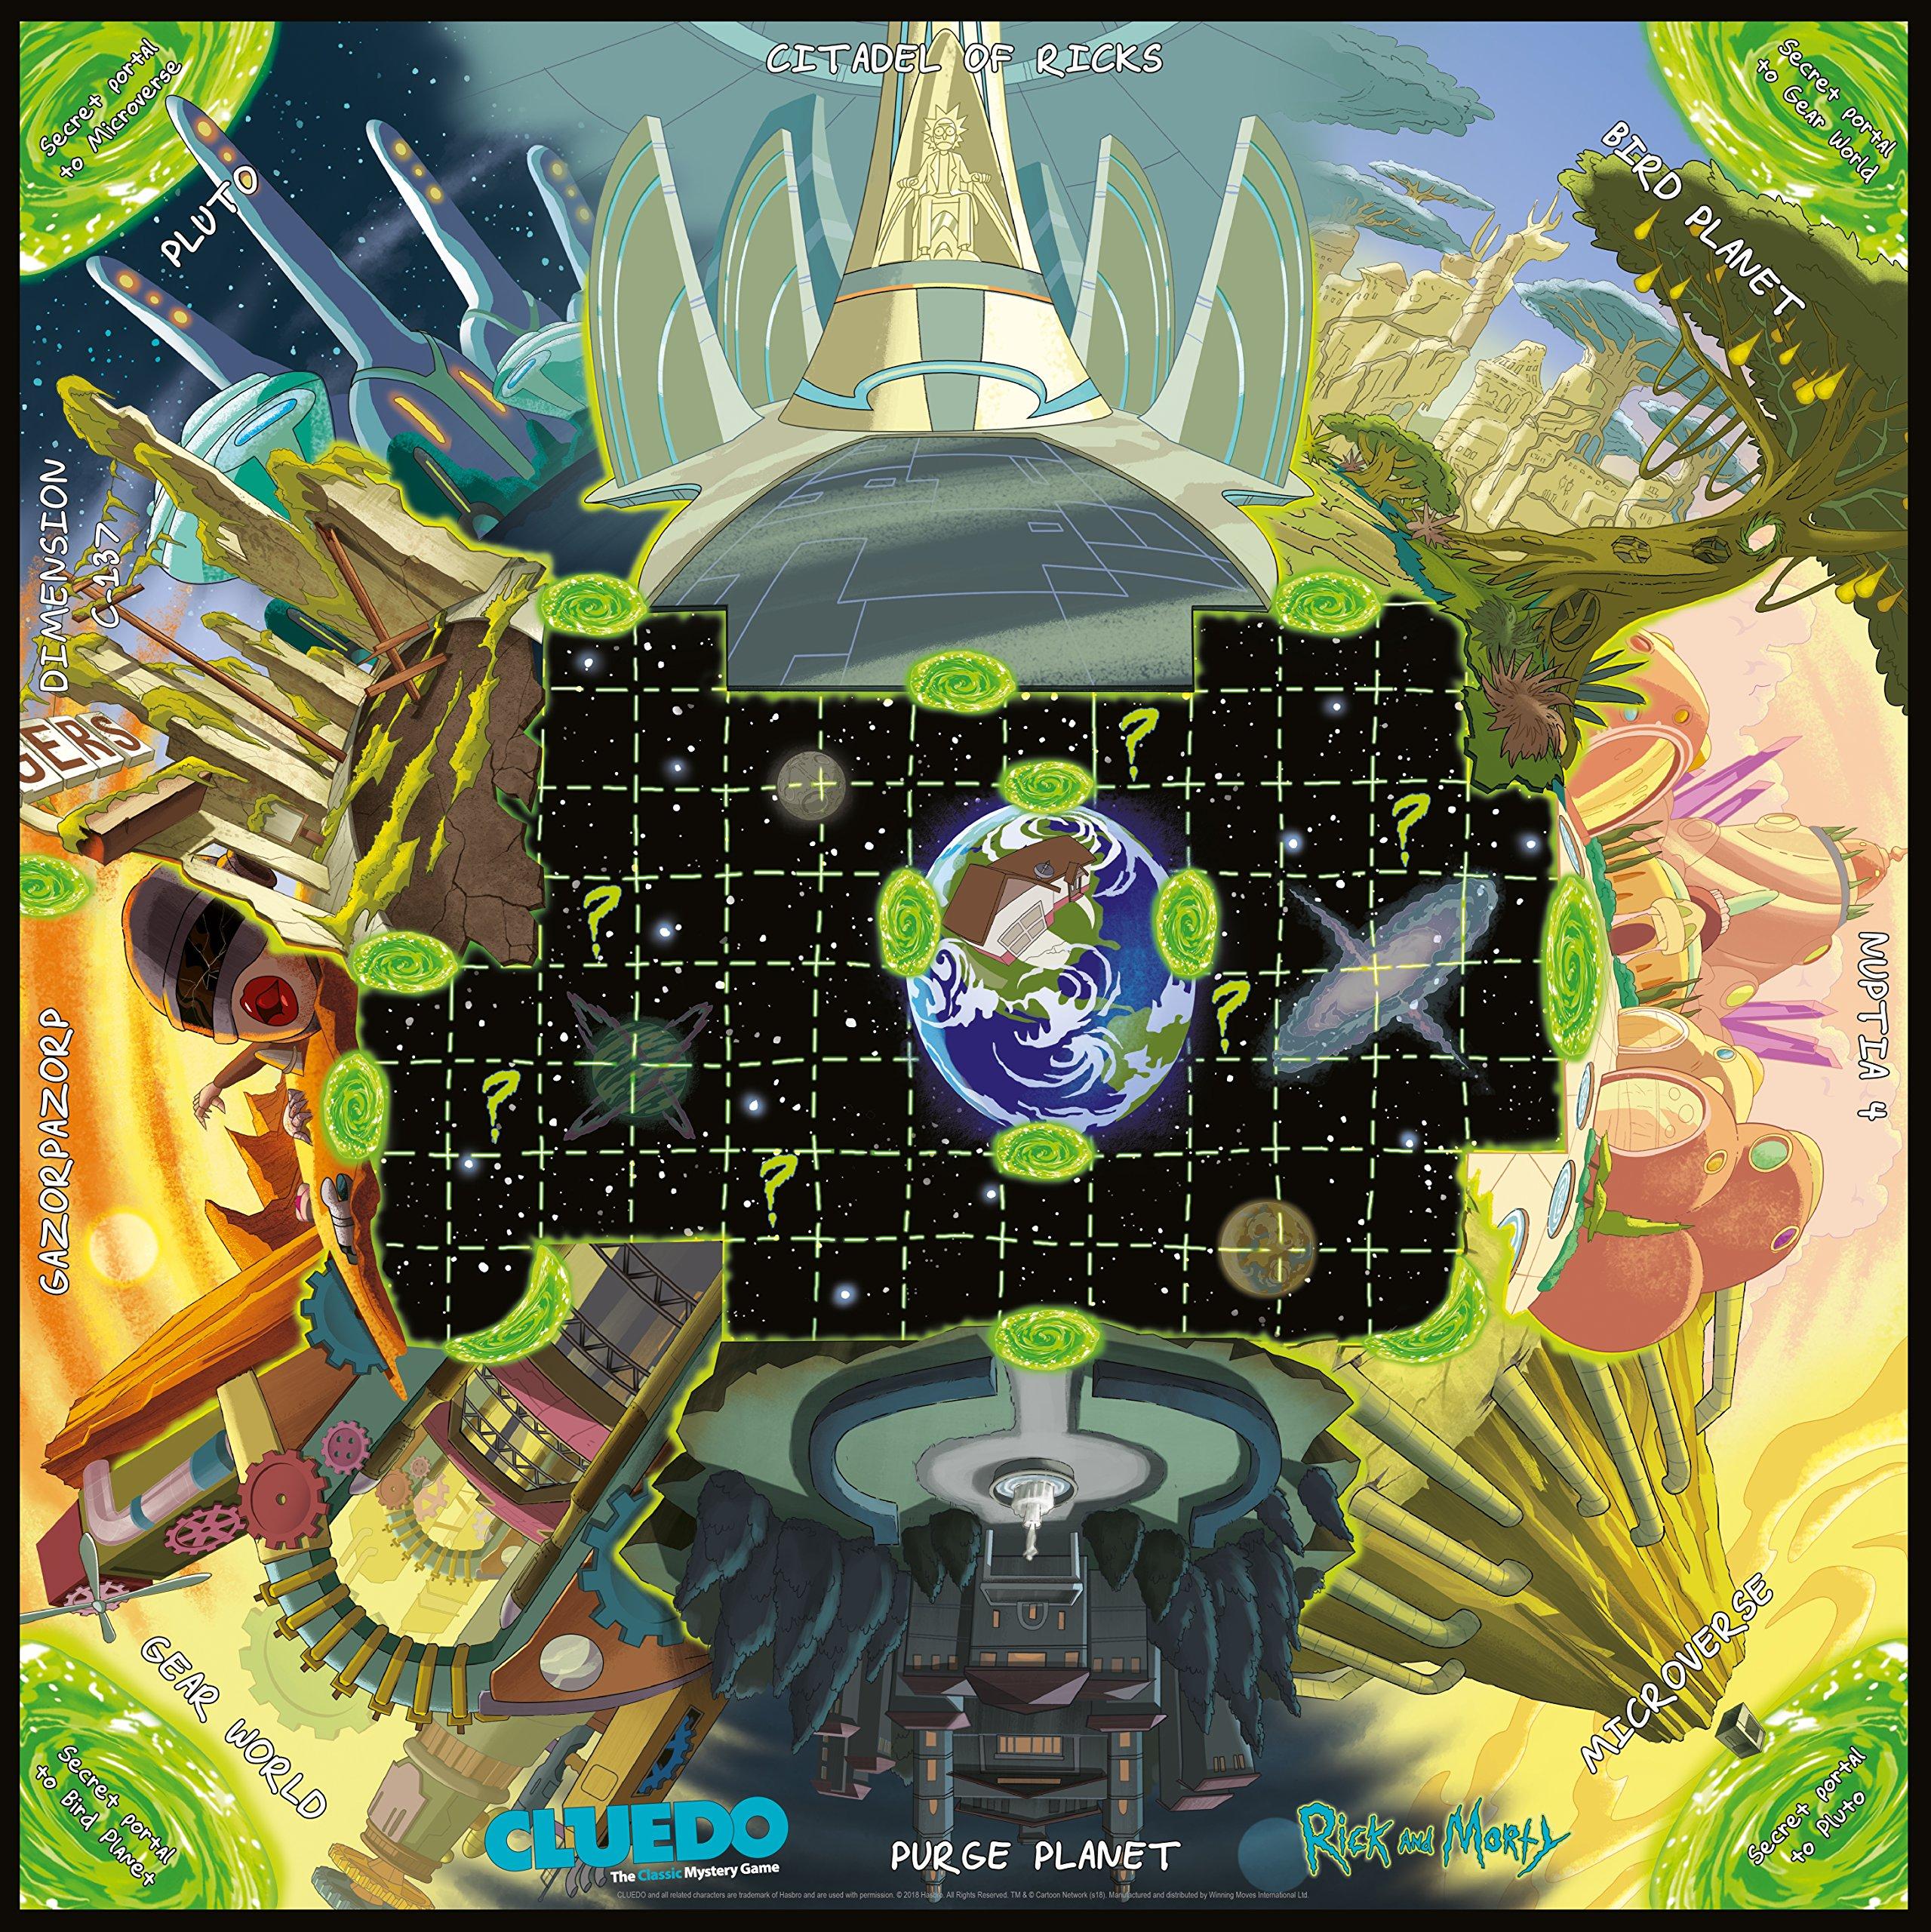 Rick And Morty Cluedo Board Game: Amazon.es: Libros en idiomas extranjeros